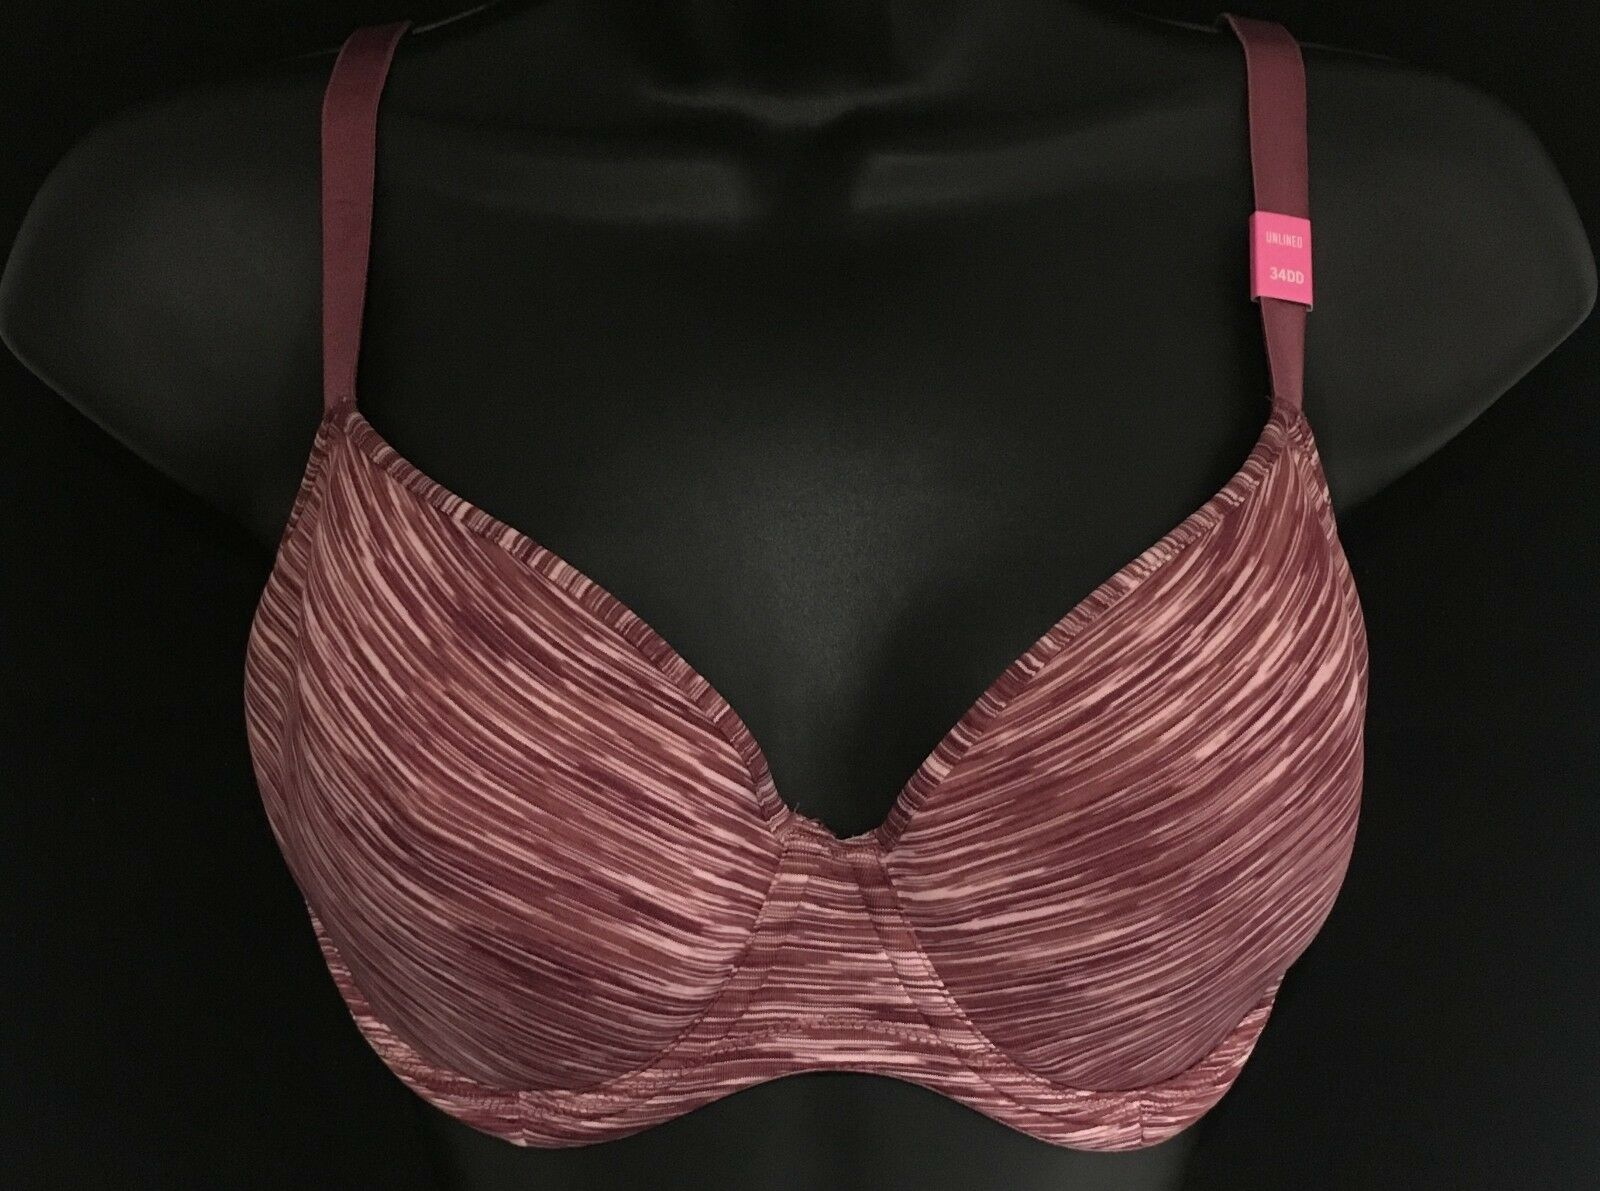 Victoria's Secret Pink Unlined Bra (34DD)